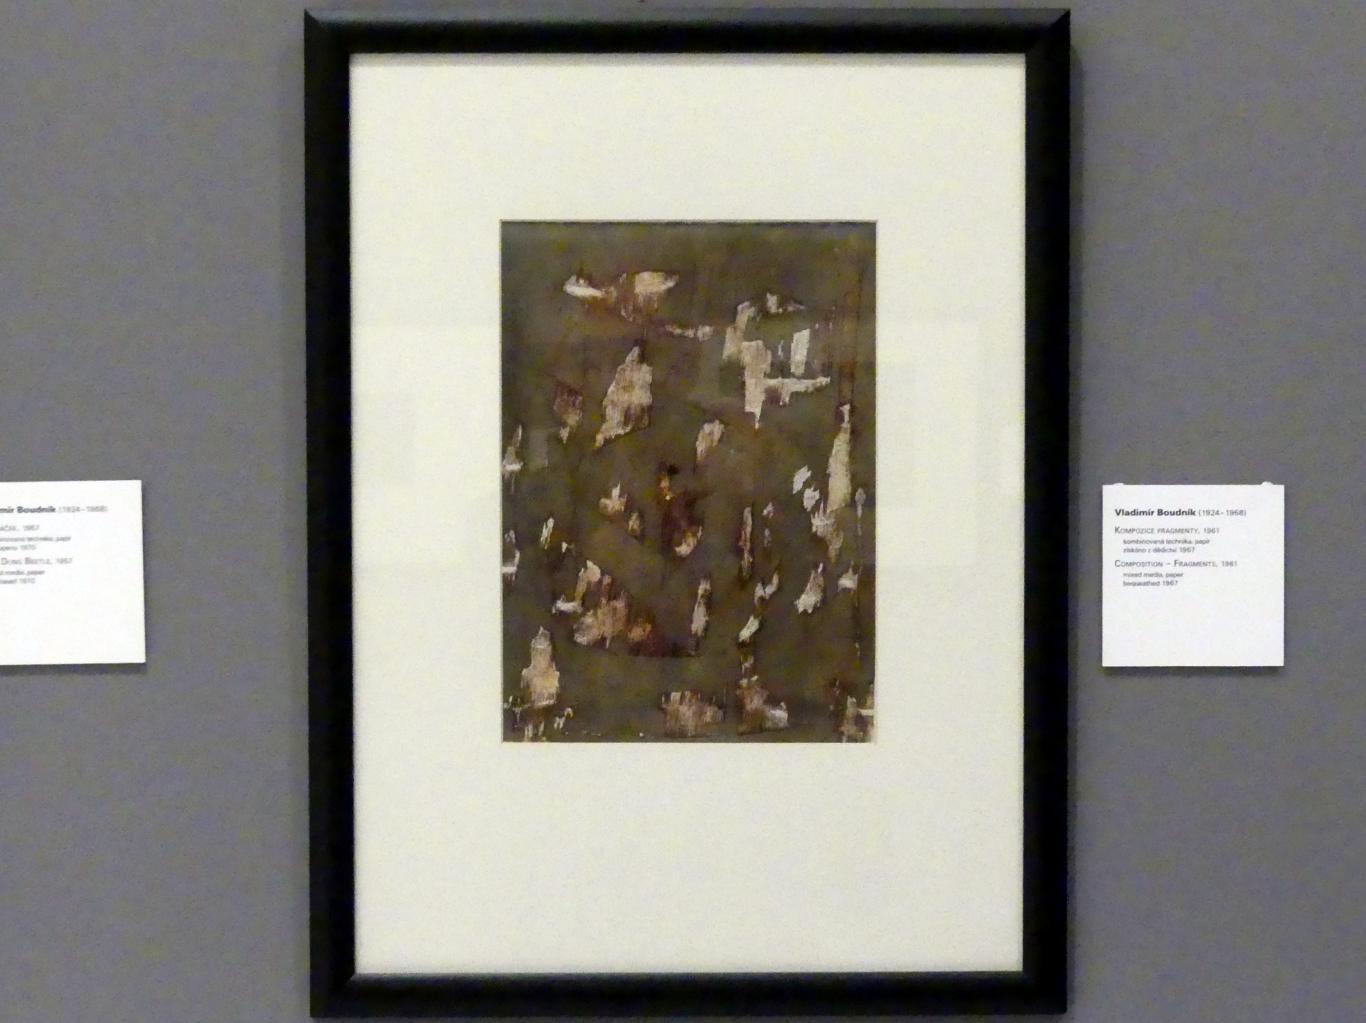 Vladimír Boudník: Komposition - Fragmente, 1961